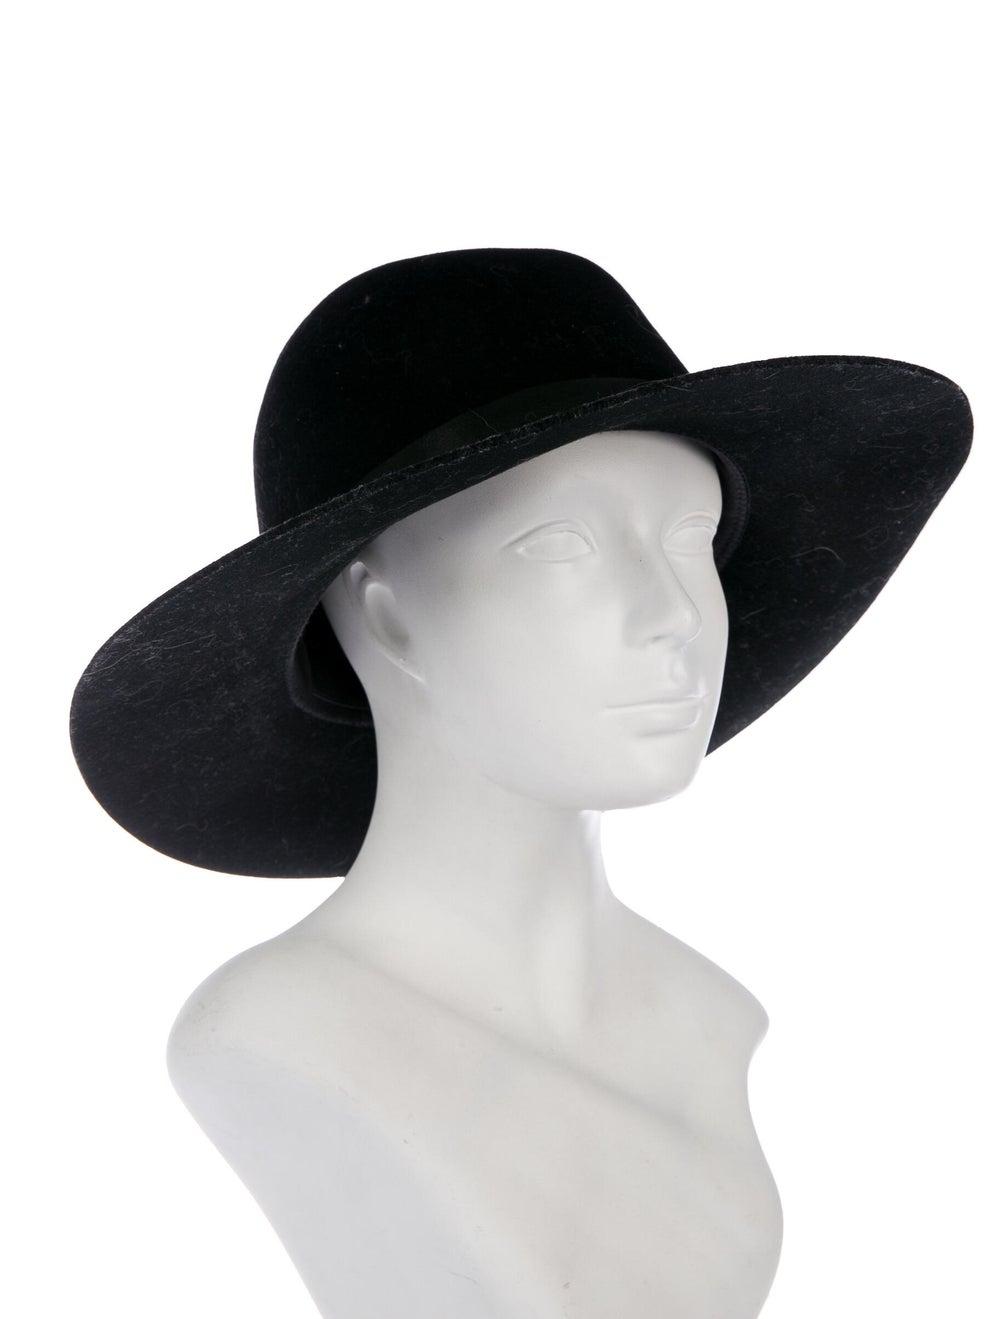 Janessa Leone Wool Felt Hat Black - image 3